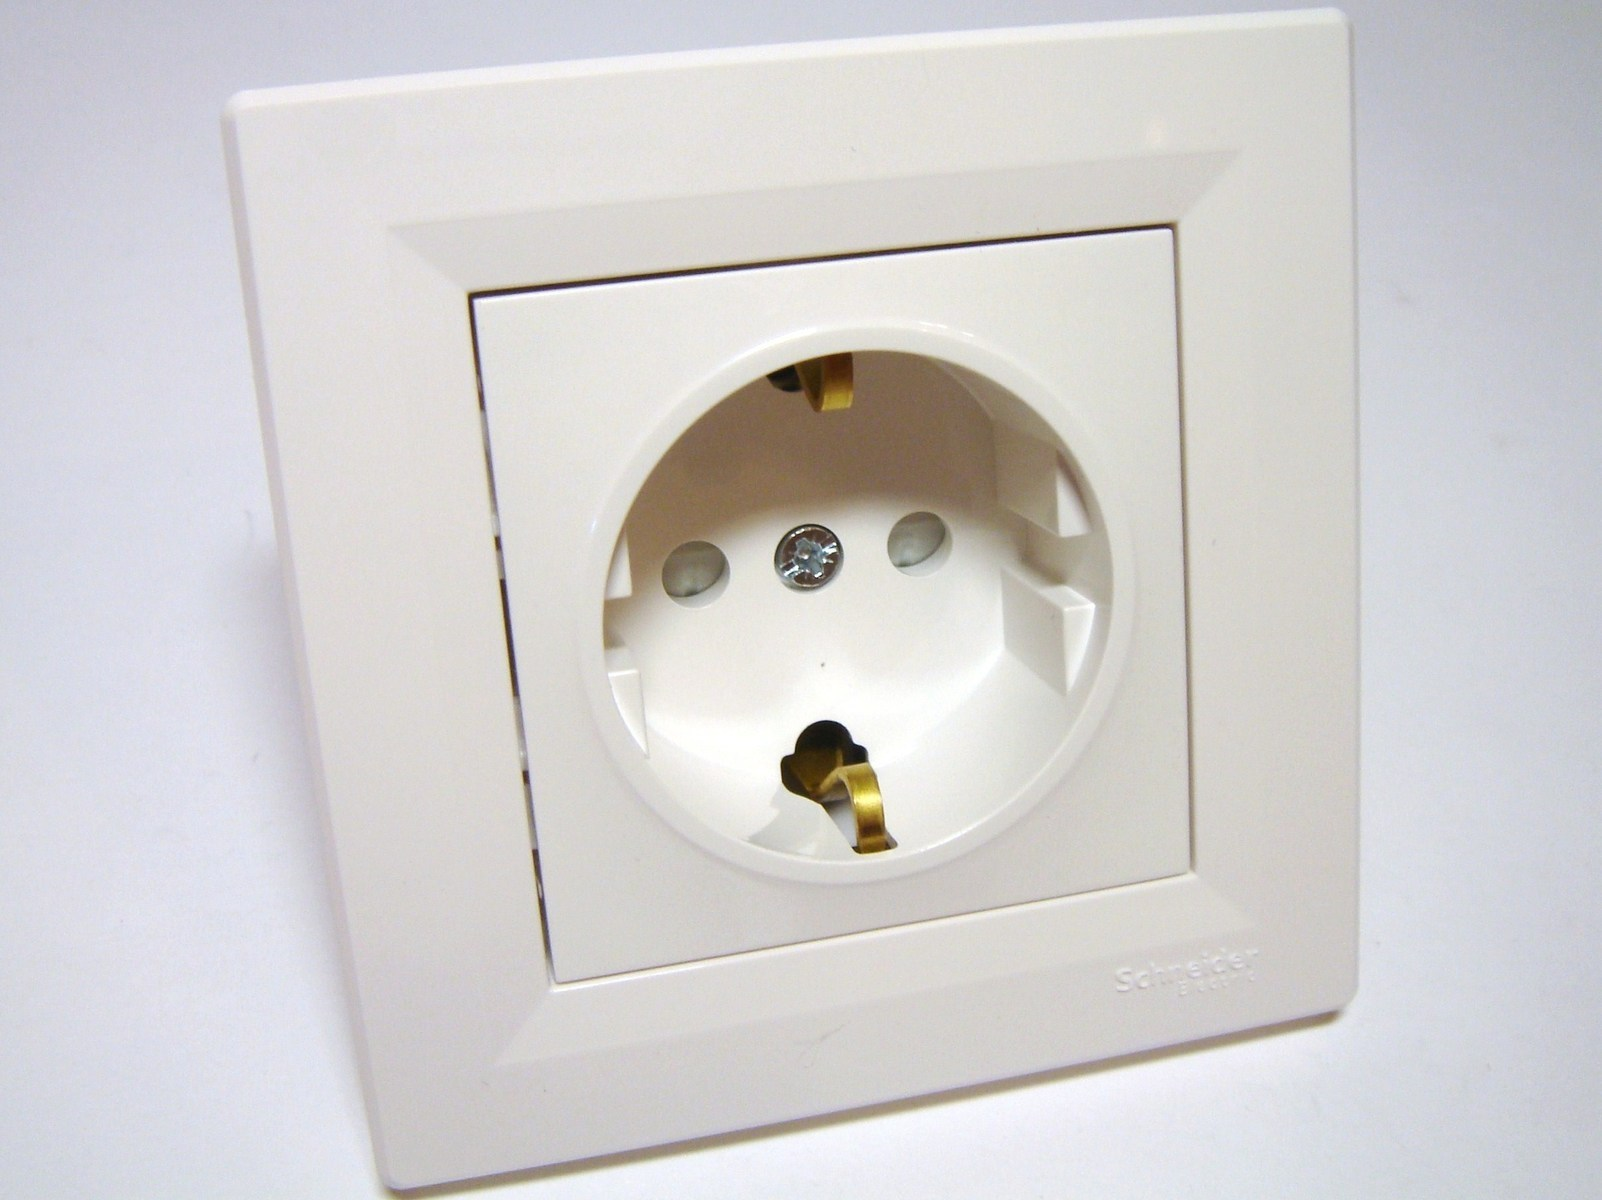 Süvispaigaldusega pistikupesa Schneider Electric (sari - Asfora), EPH2900221